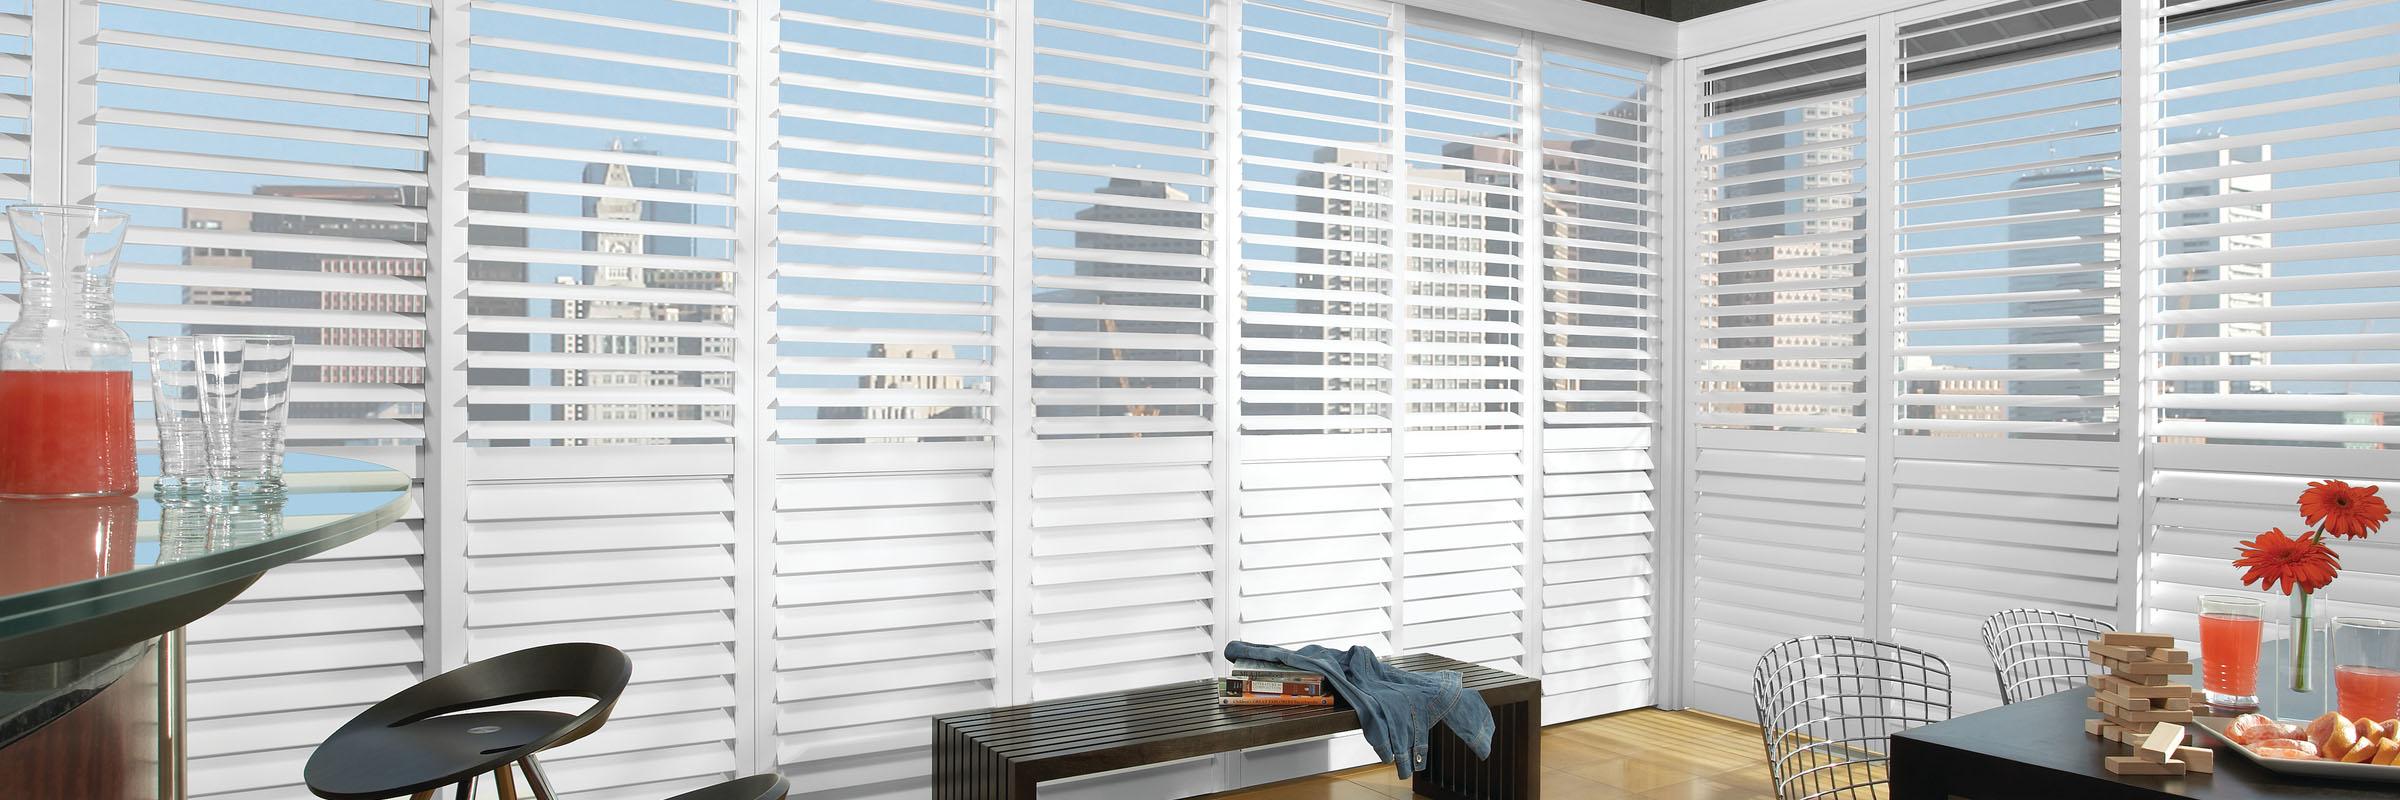 Custom shutters in Hybrid True White - NewStyle